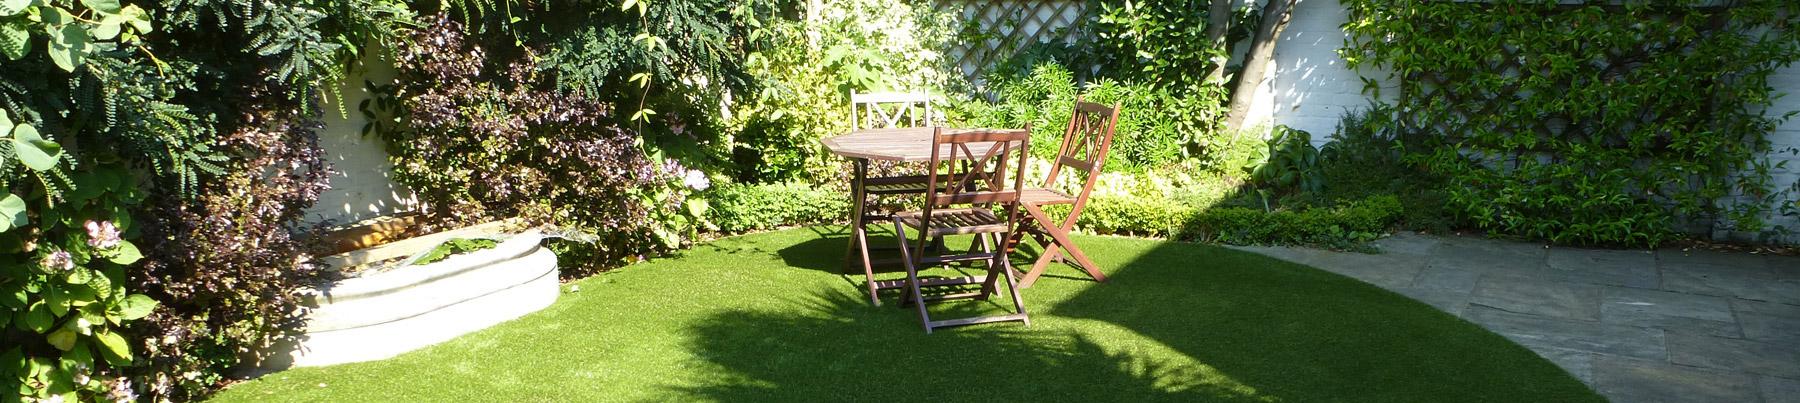 Garden Centre: Welcome To West Sussex Artificial Grass